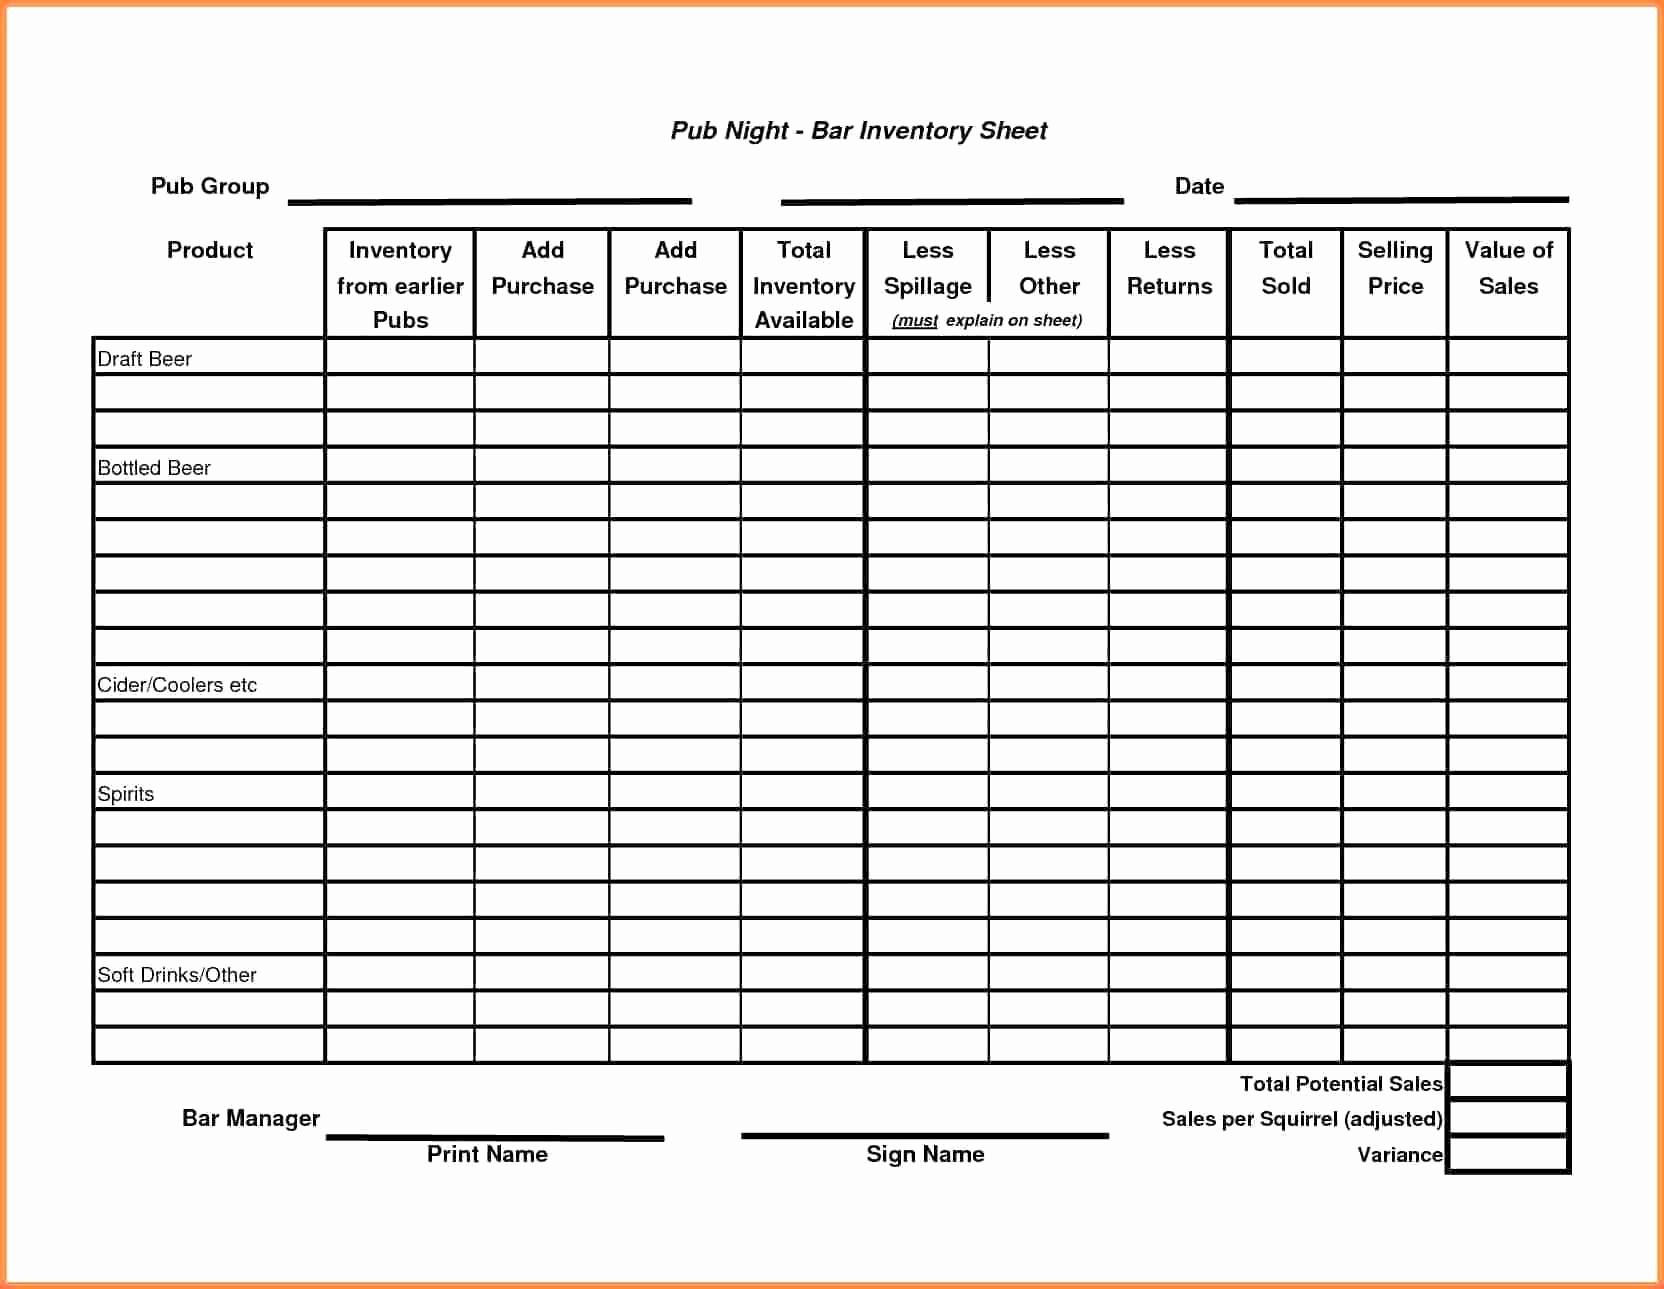 Printable Liquor Inventory Sheets Beautiful Sample Liquor Inventory With Bar Inventory Sheet Template Free